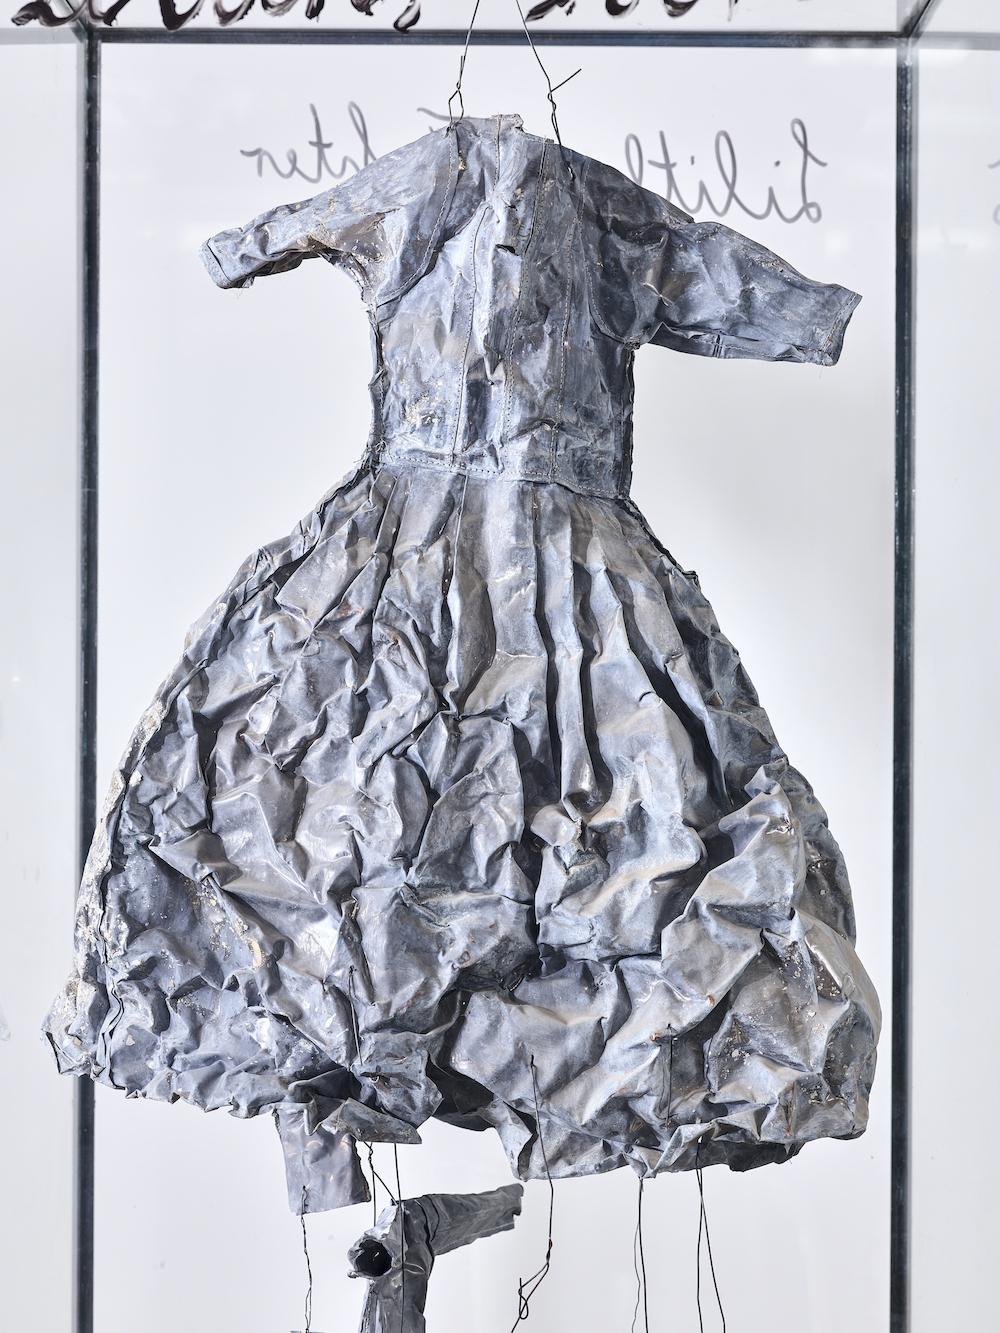 Anselm Kiefer, Opus Magnum – Liliths Töchter, 2015, Kiefer-Sammlung Grothe im Franz Marc Museum © Anselm Kiefer, Foto: collecto.art